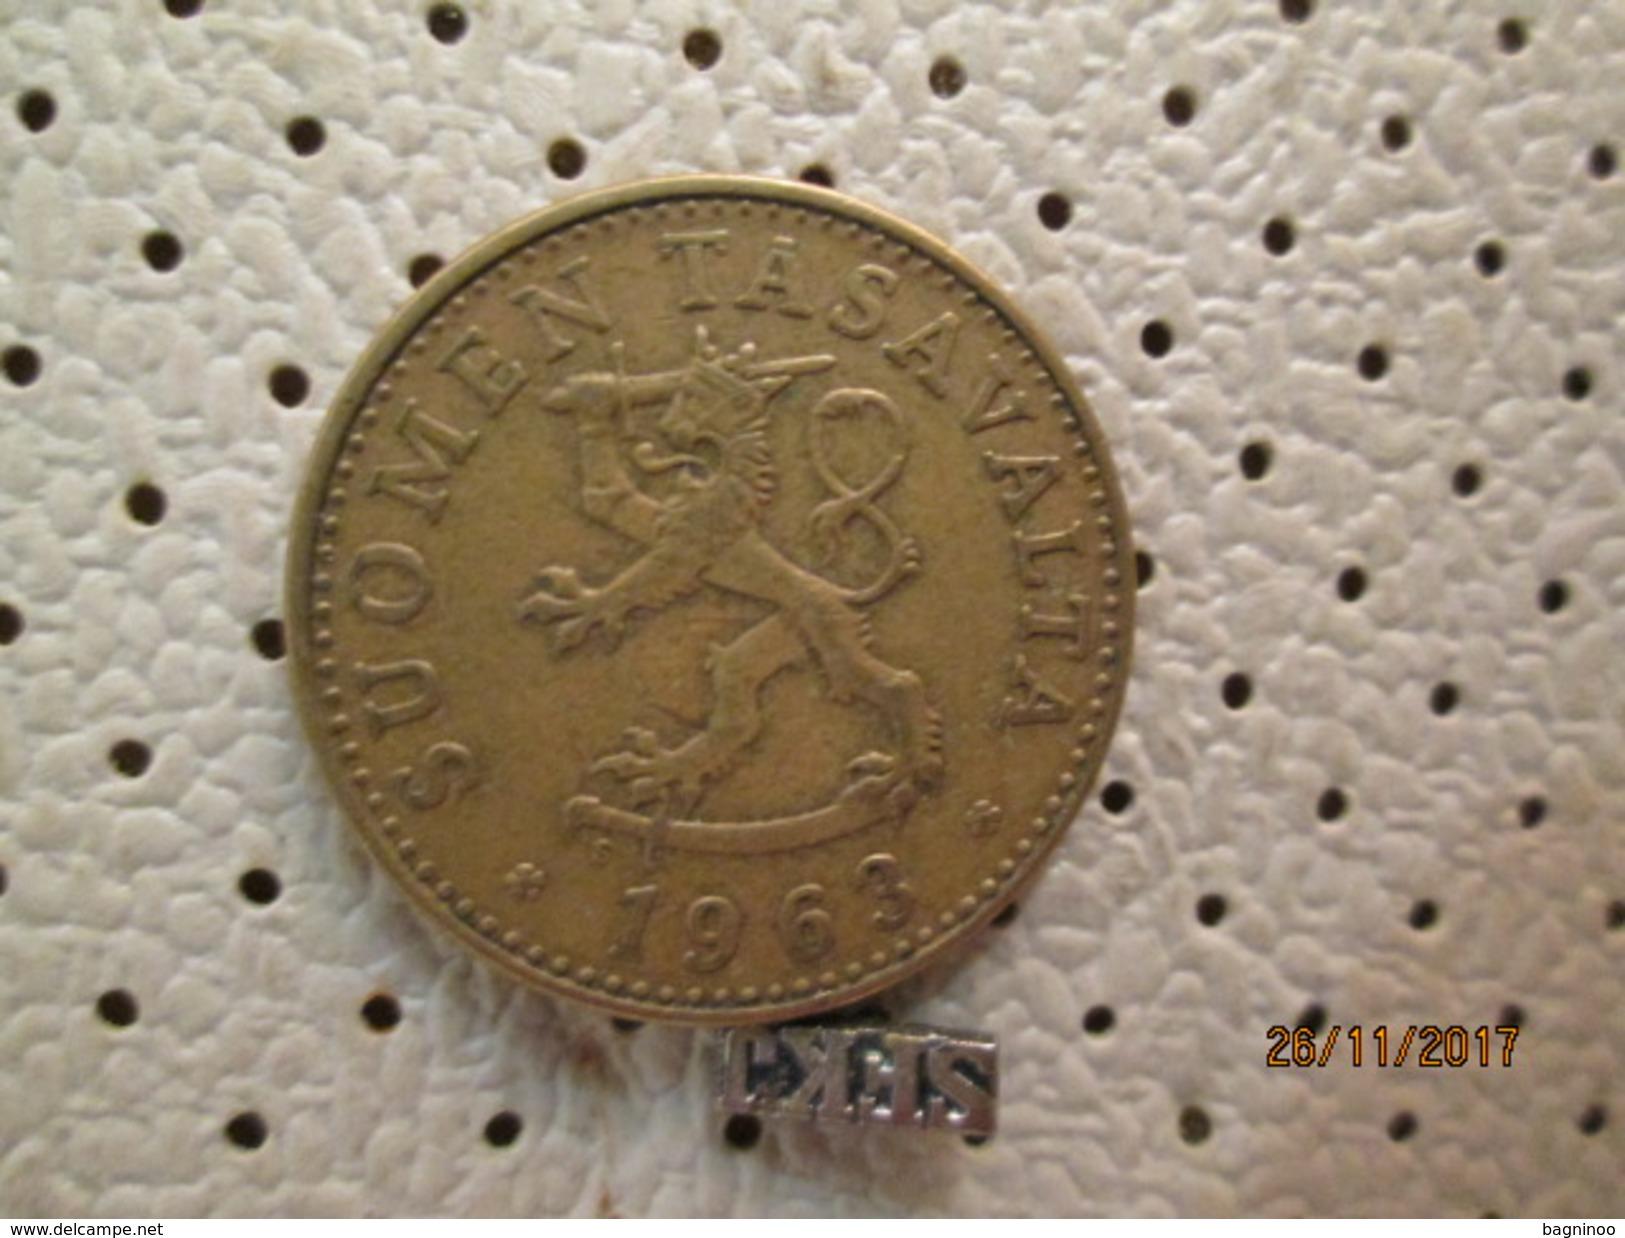 FINLAND 50 Pennia 1963 # 5 - Finland